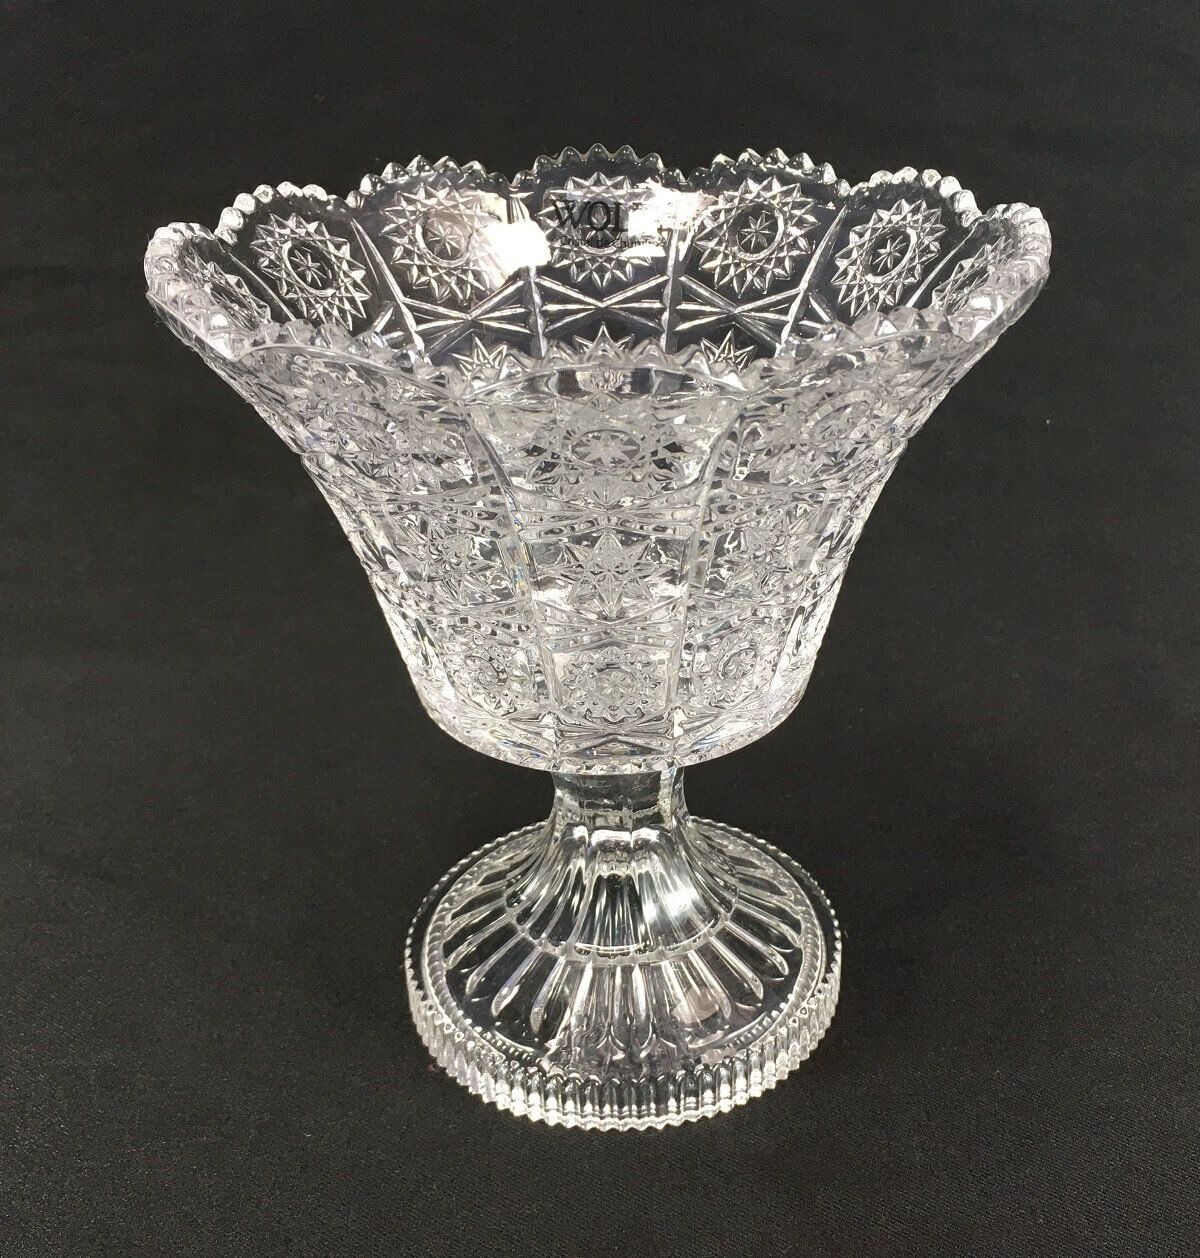 Vaso Em Cristal Lapidado Wolff 19cm Altura